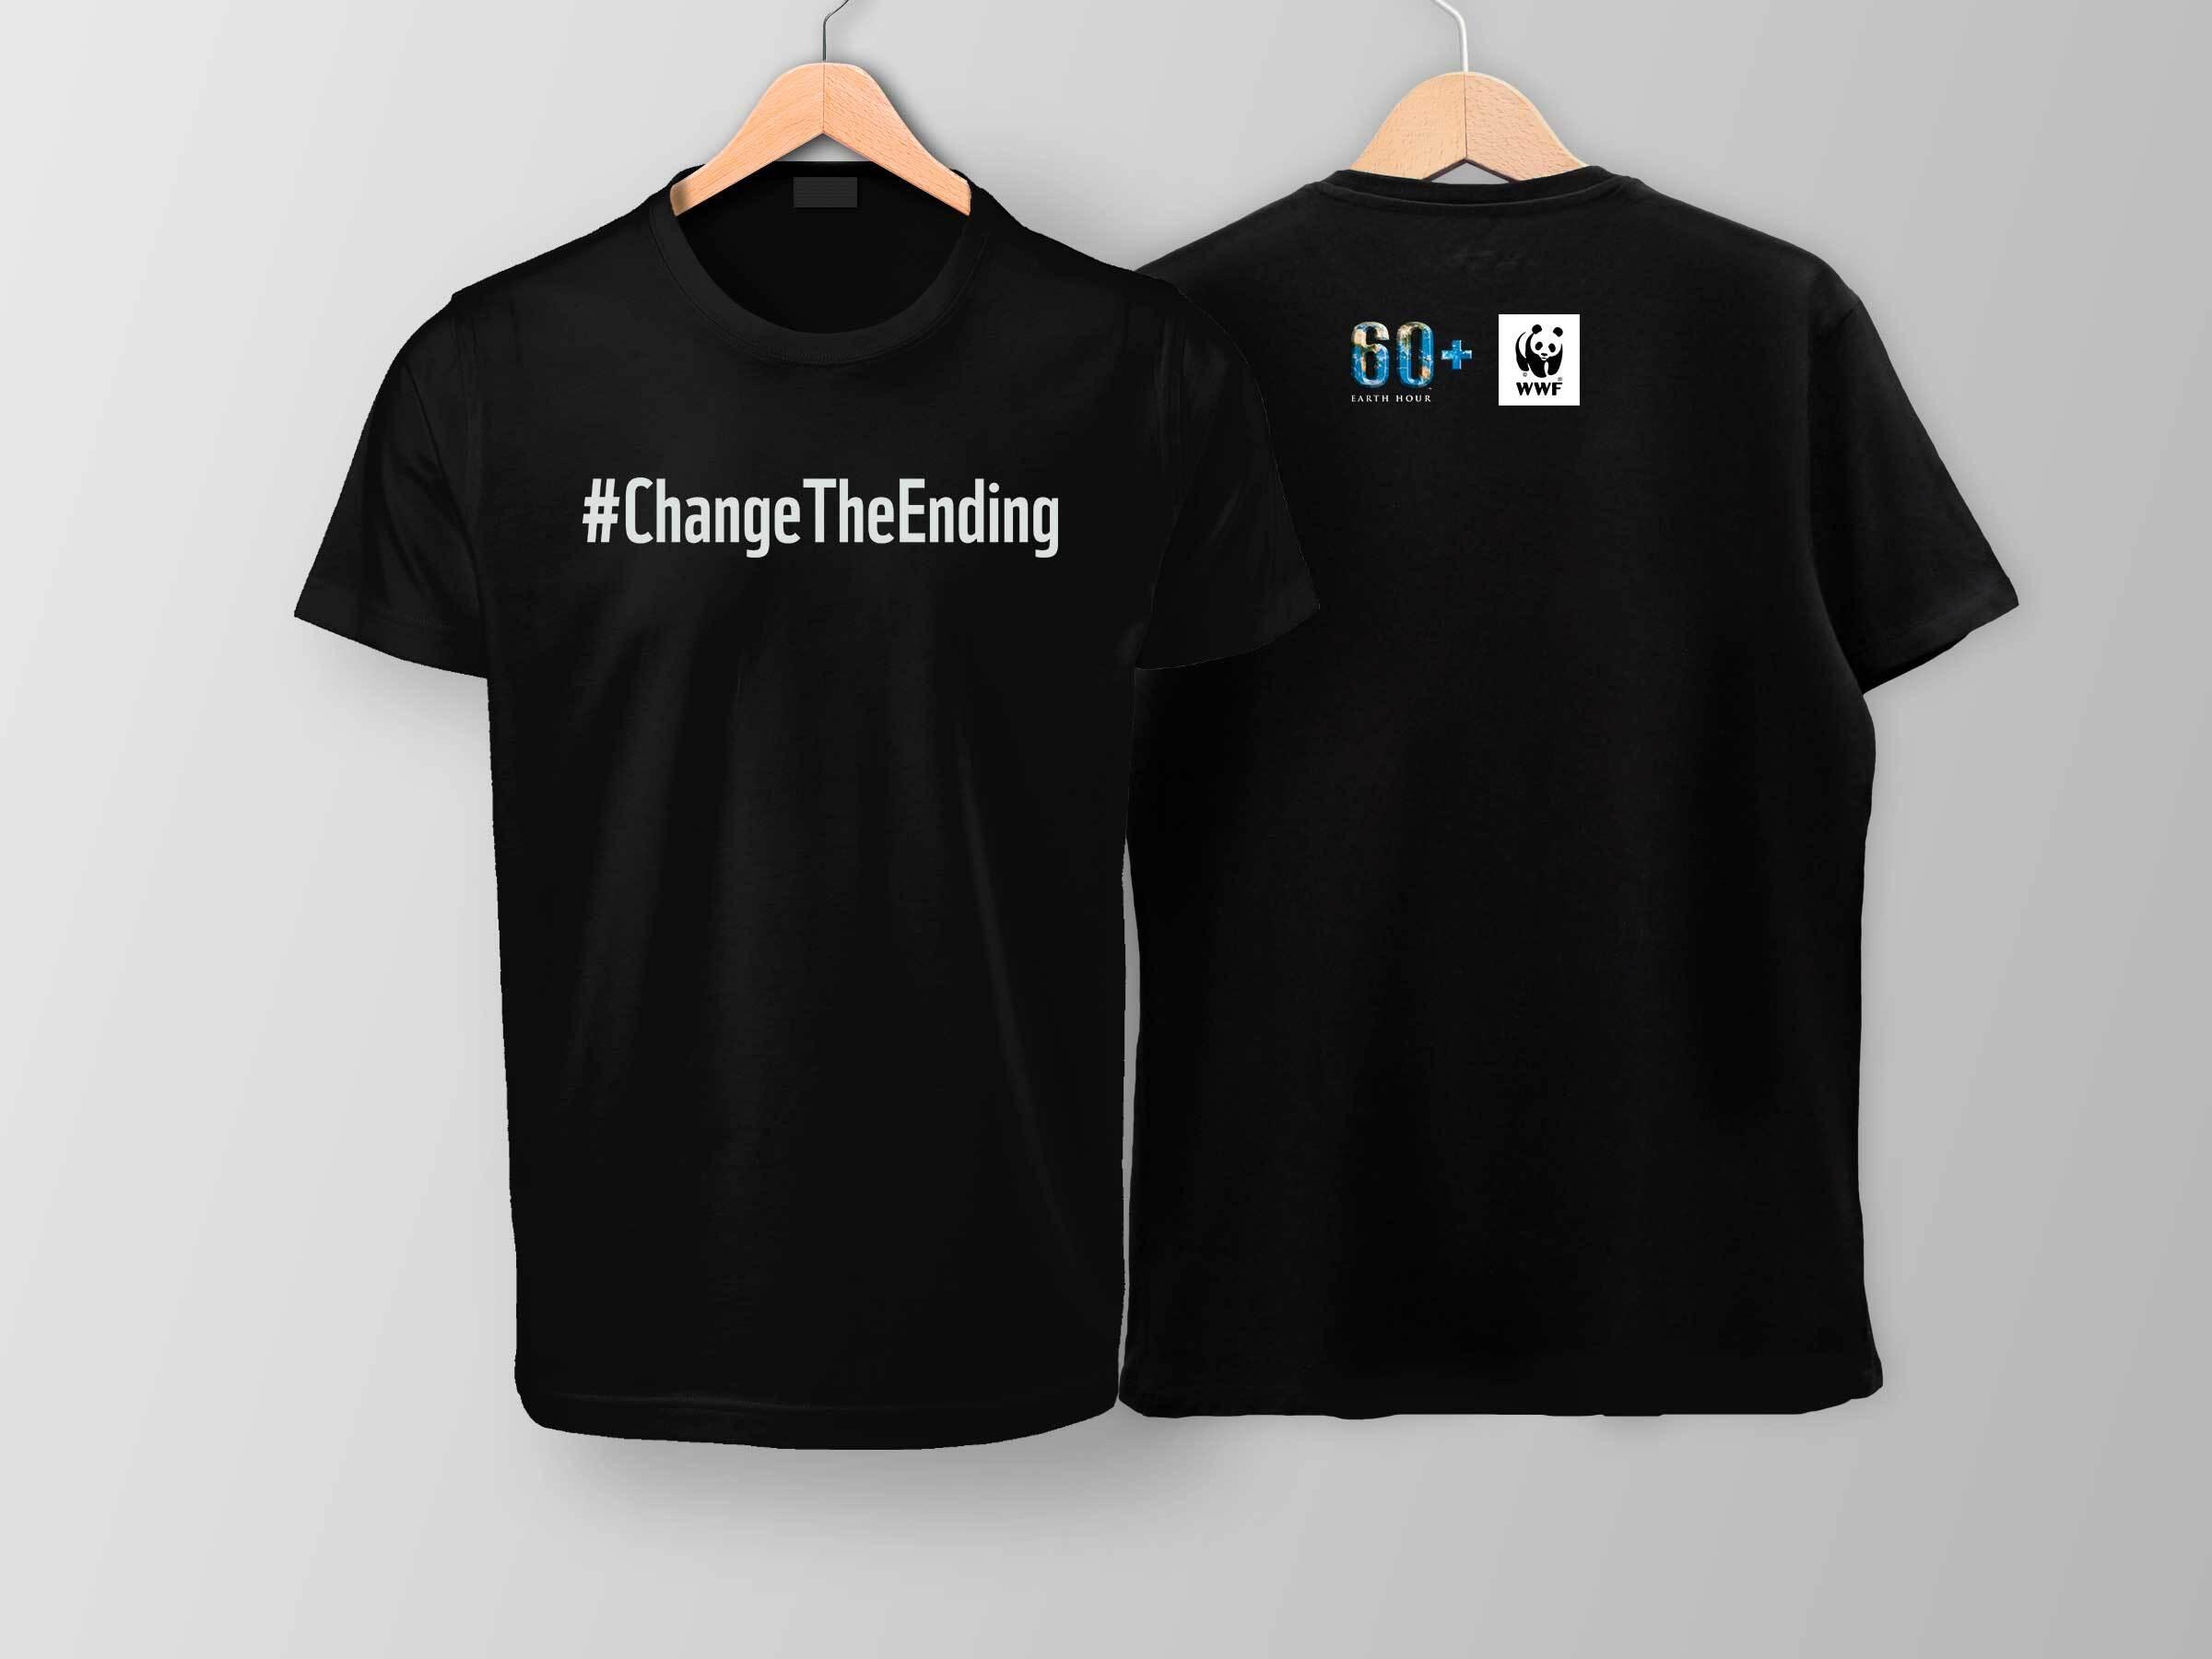 1EH2020-Shirt-Hashtag-Mockup-on-Black-1